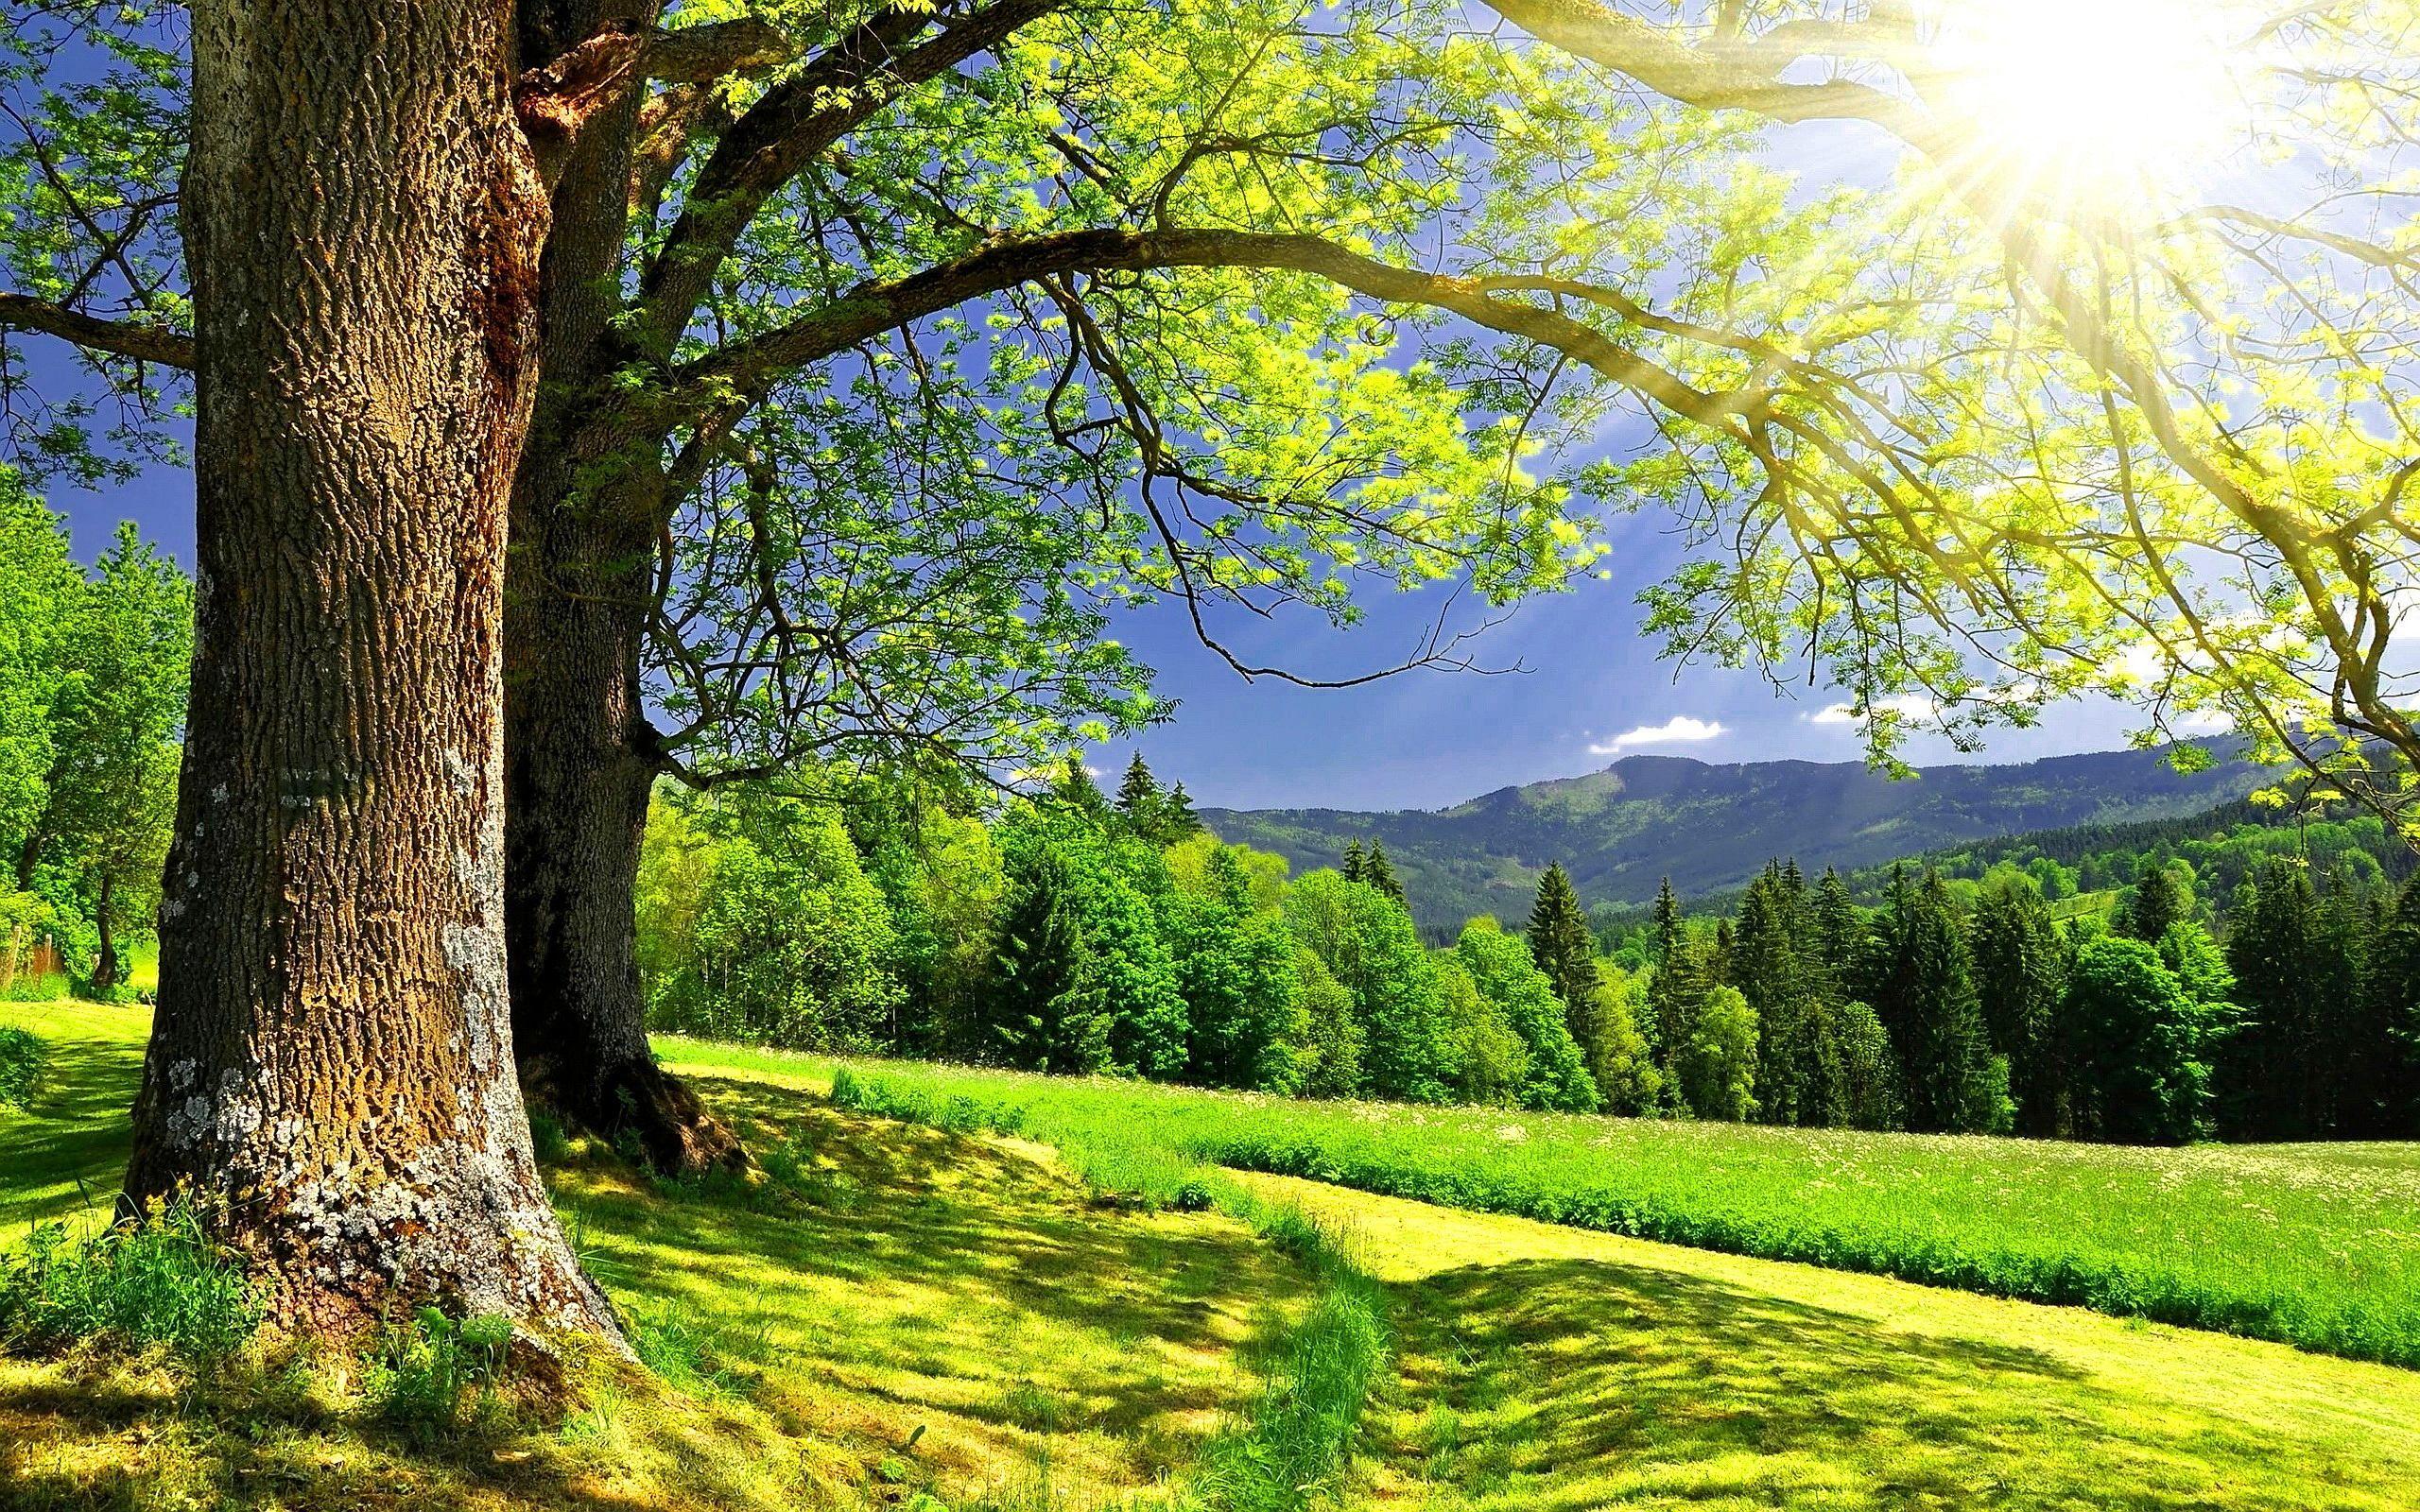 Sunny Summer Day 7025851 Summer Landscape wallpaper Nature 2560x1600